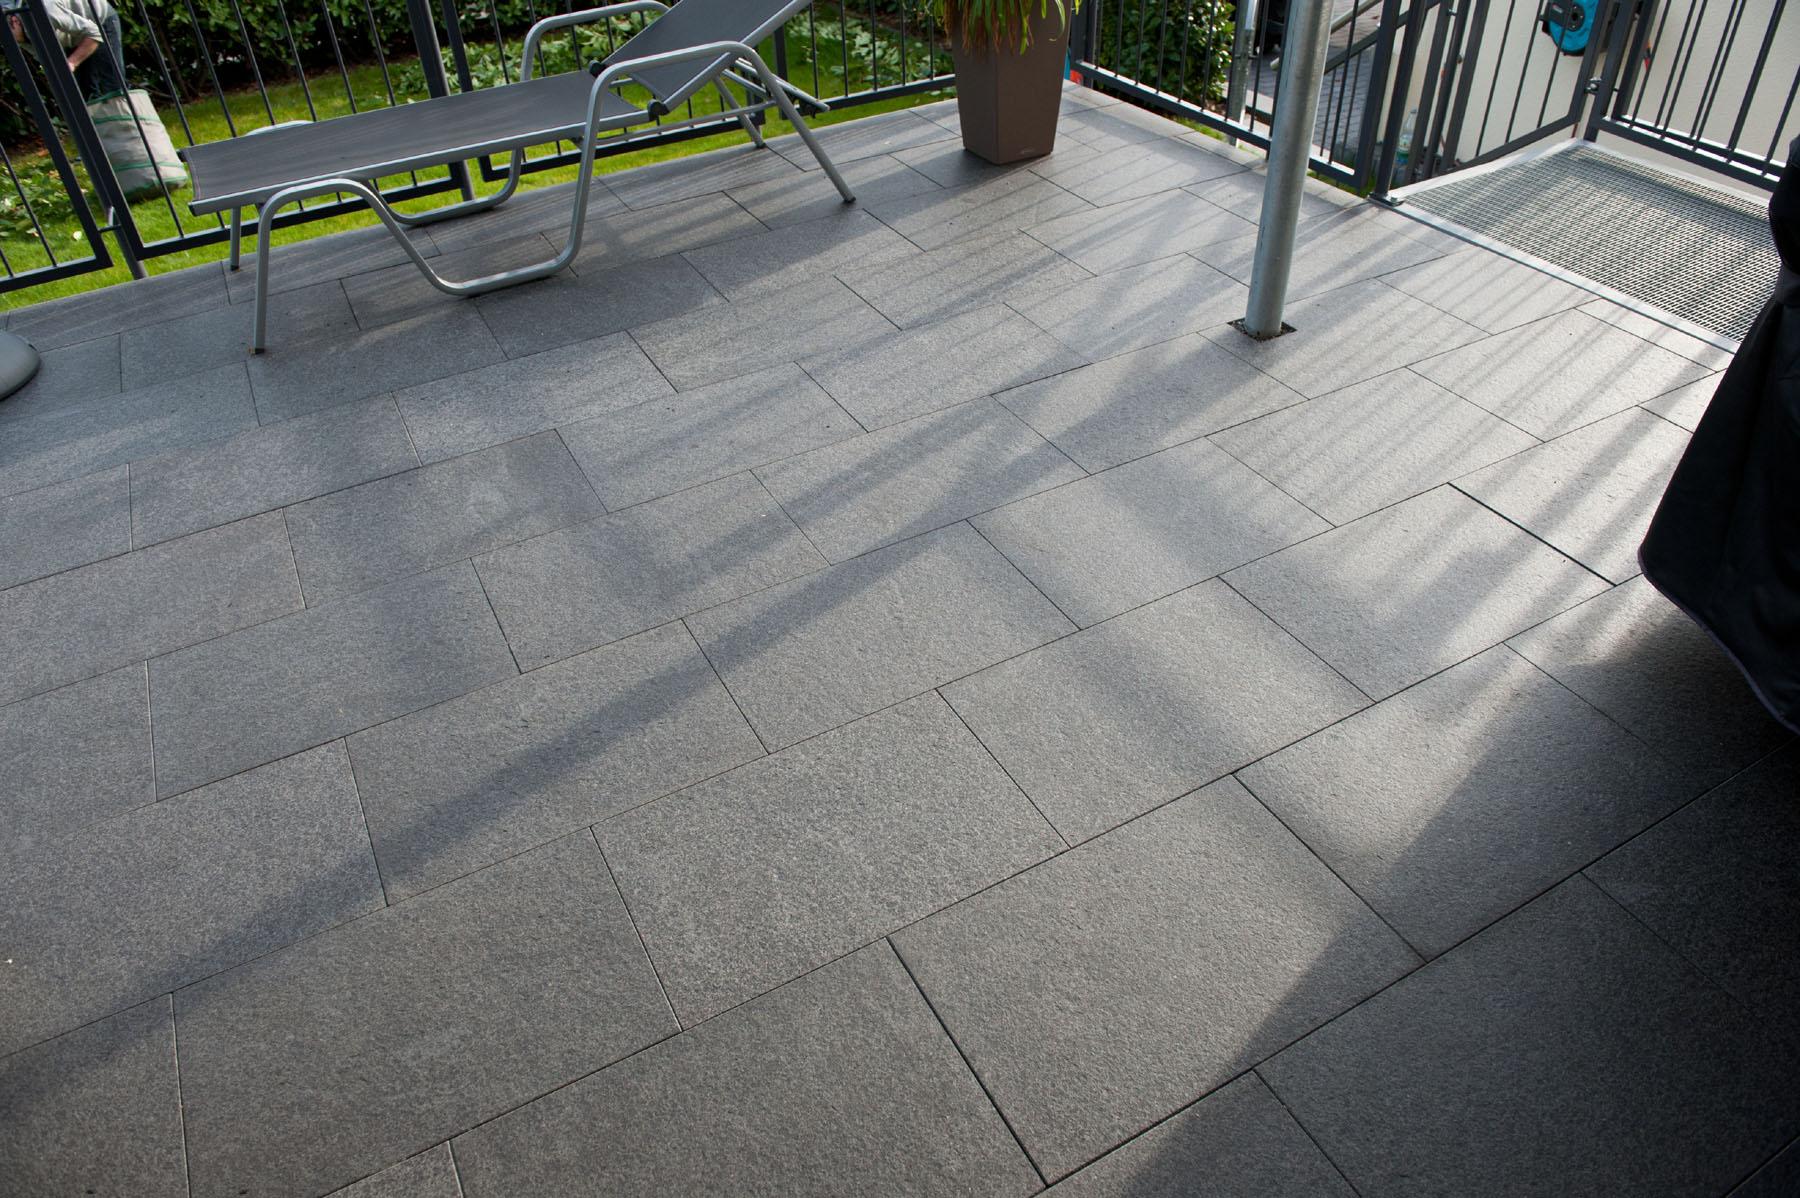 Uhl Terrassenplatten Klassische Terrassenplatten 6